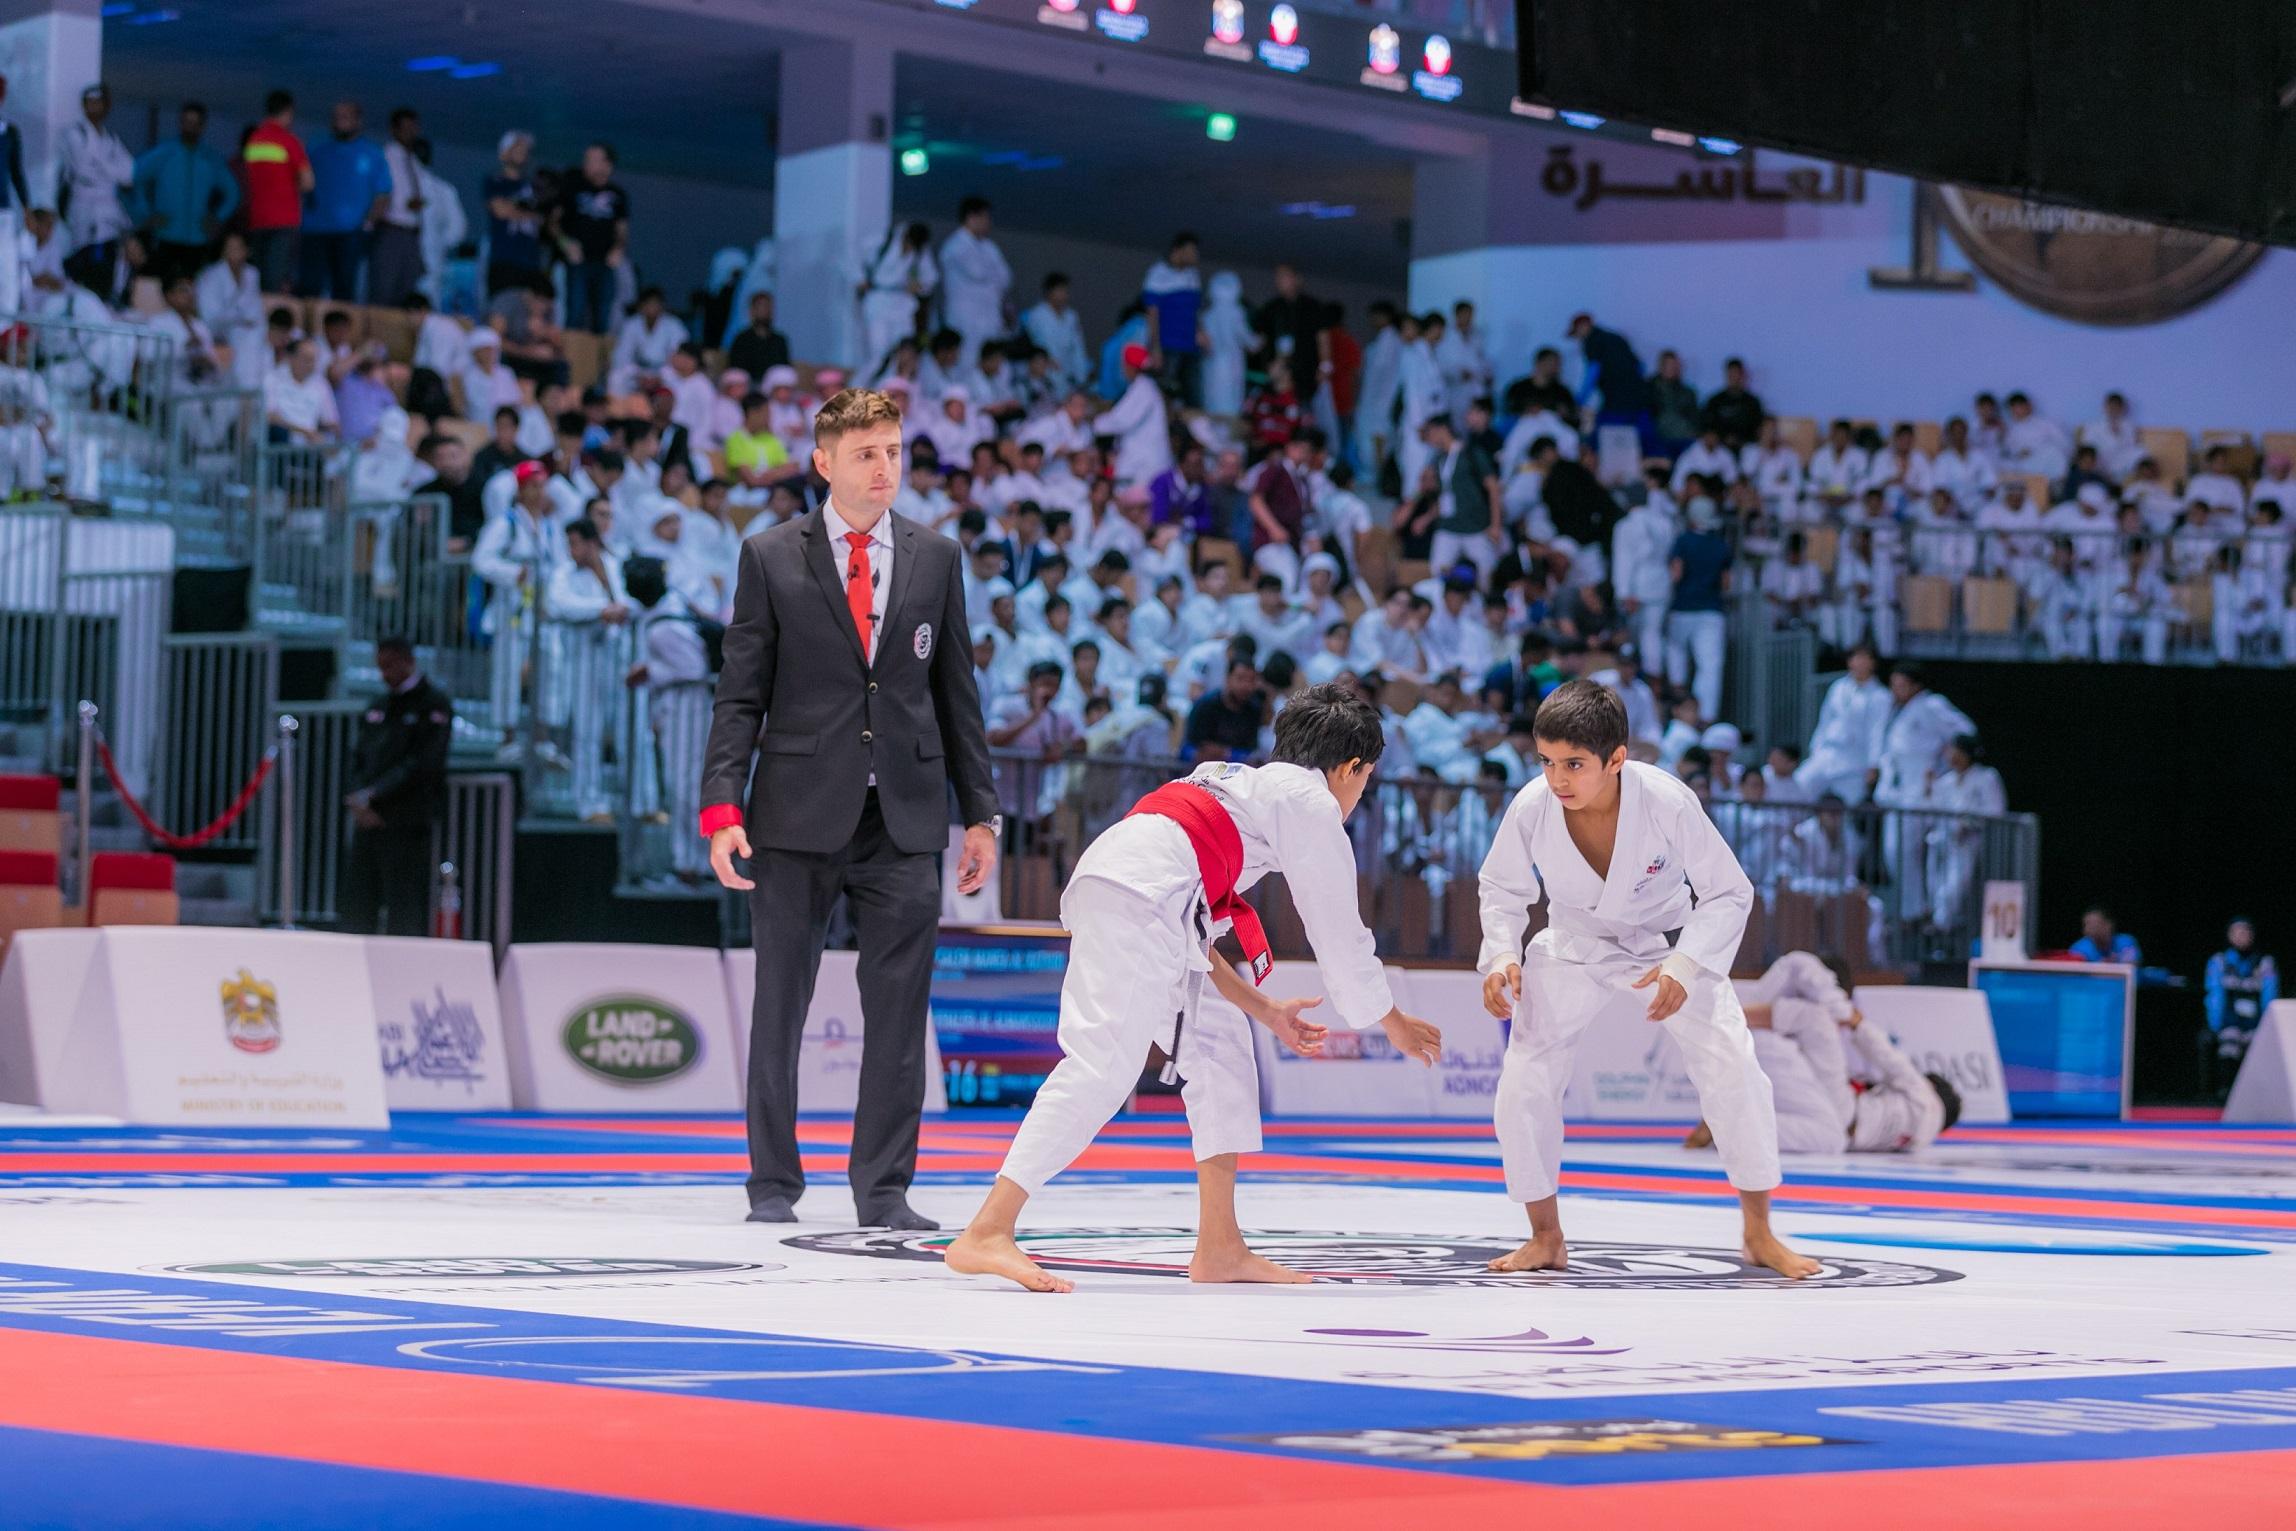 global athletes to partake in abu dhabi world professional jiu-jitsu championship in april 1